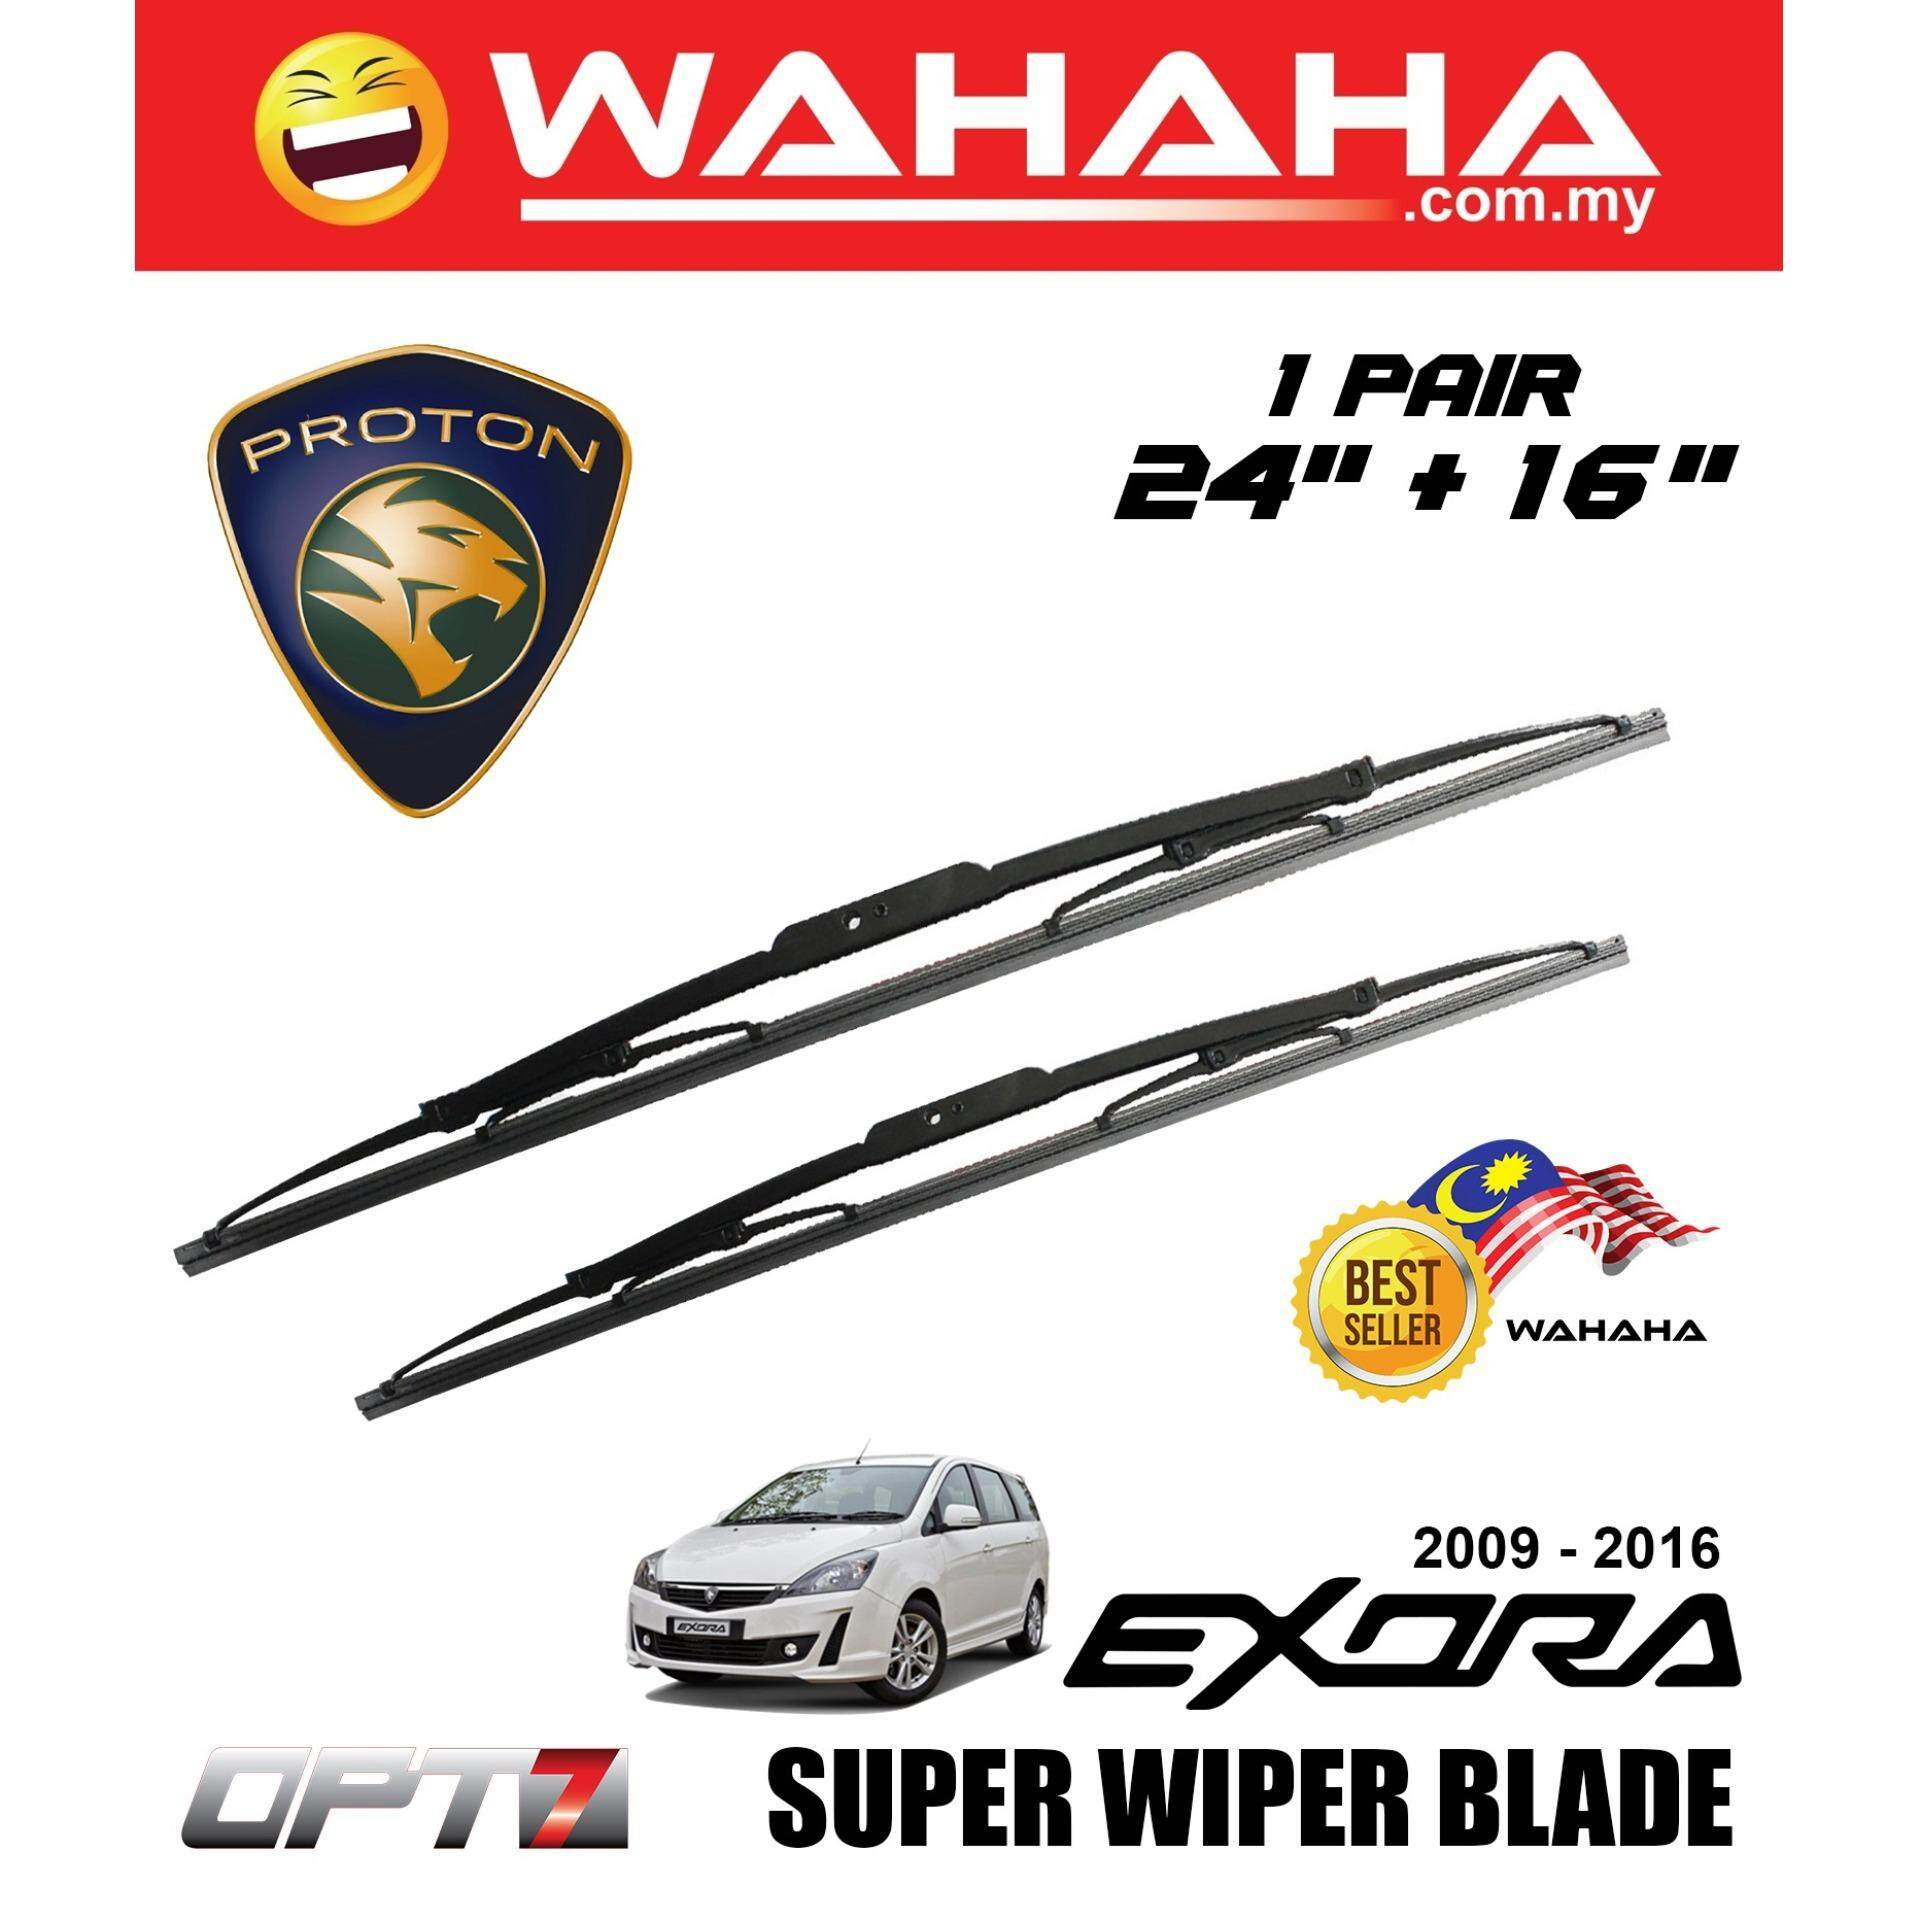 PROTON EXORA OPT7 Car Window Windshield Super Wiper Blade 24 +16